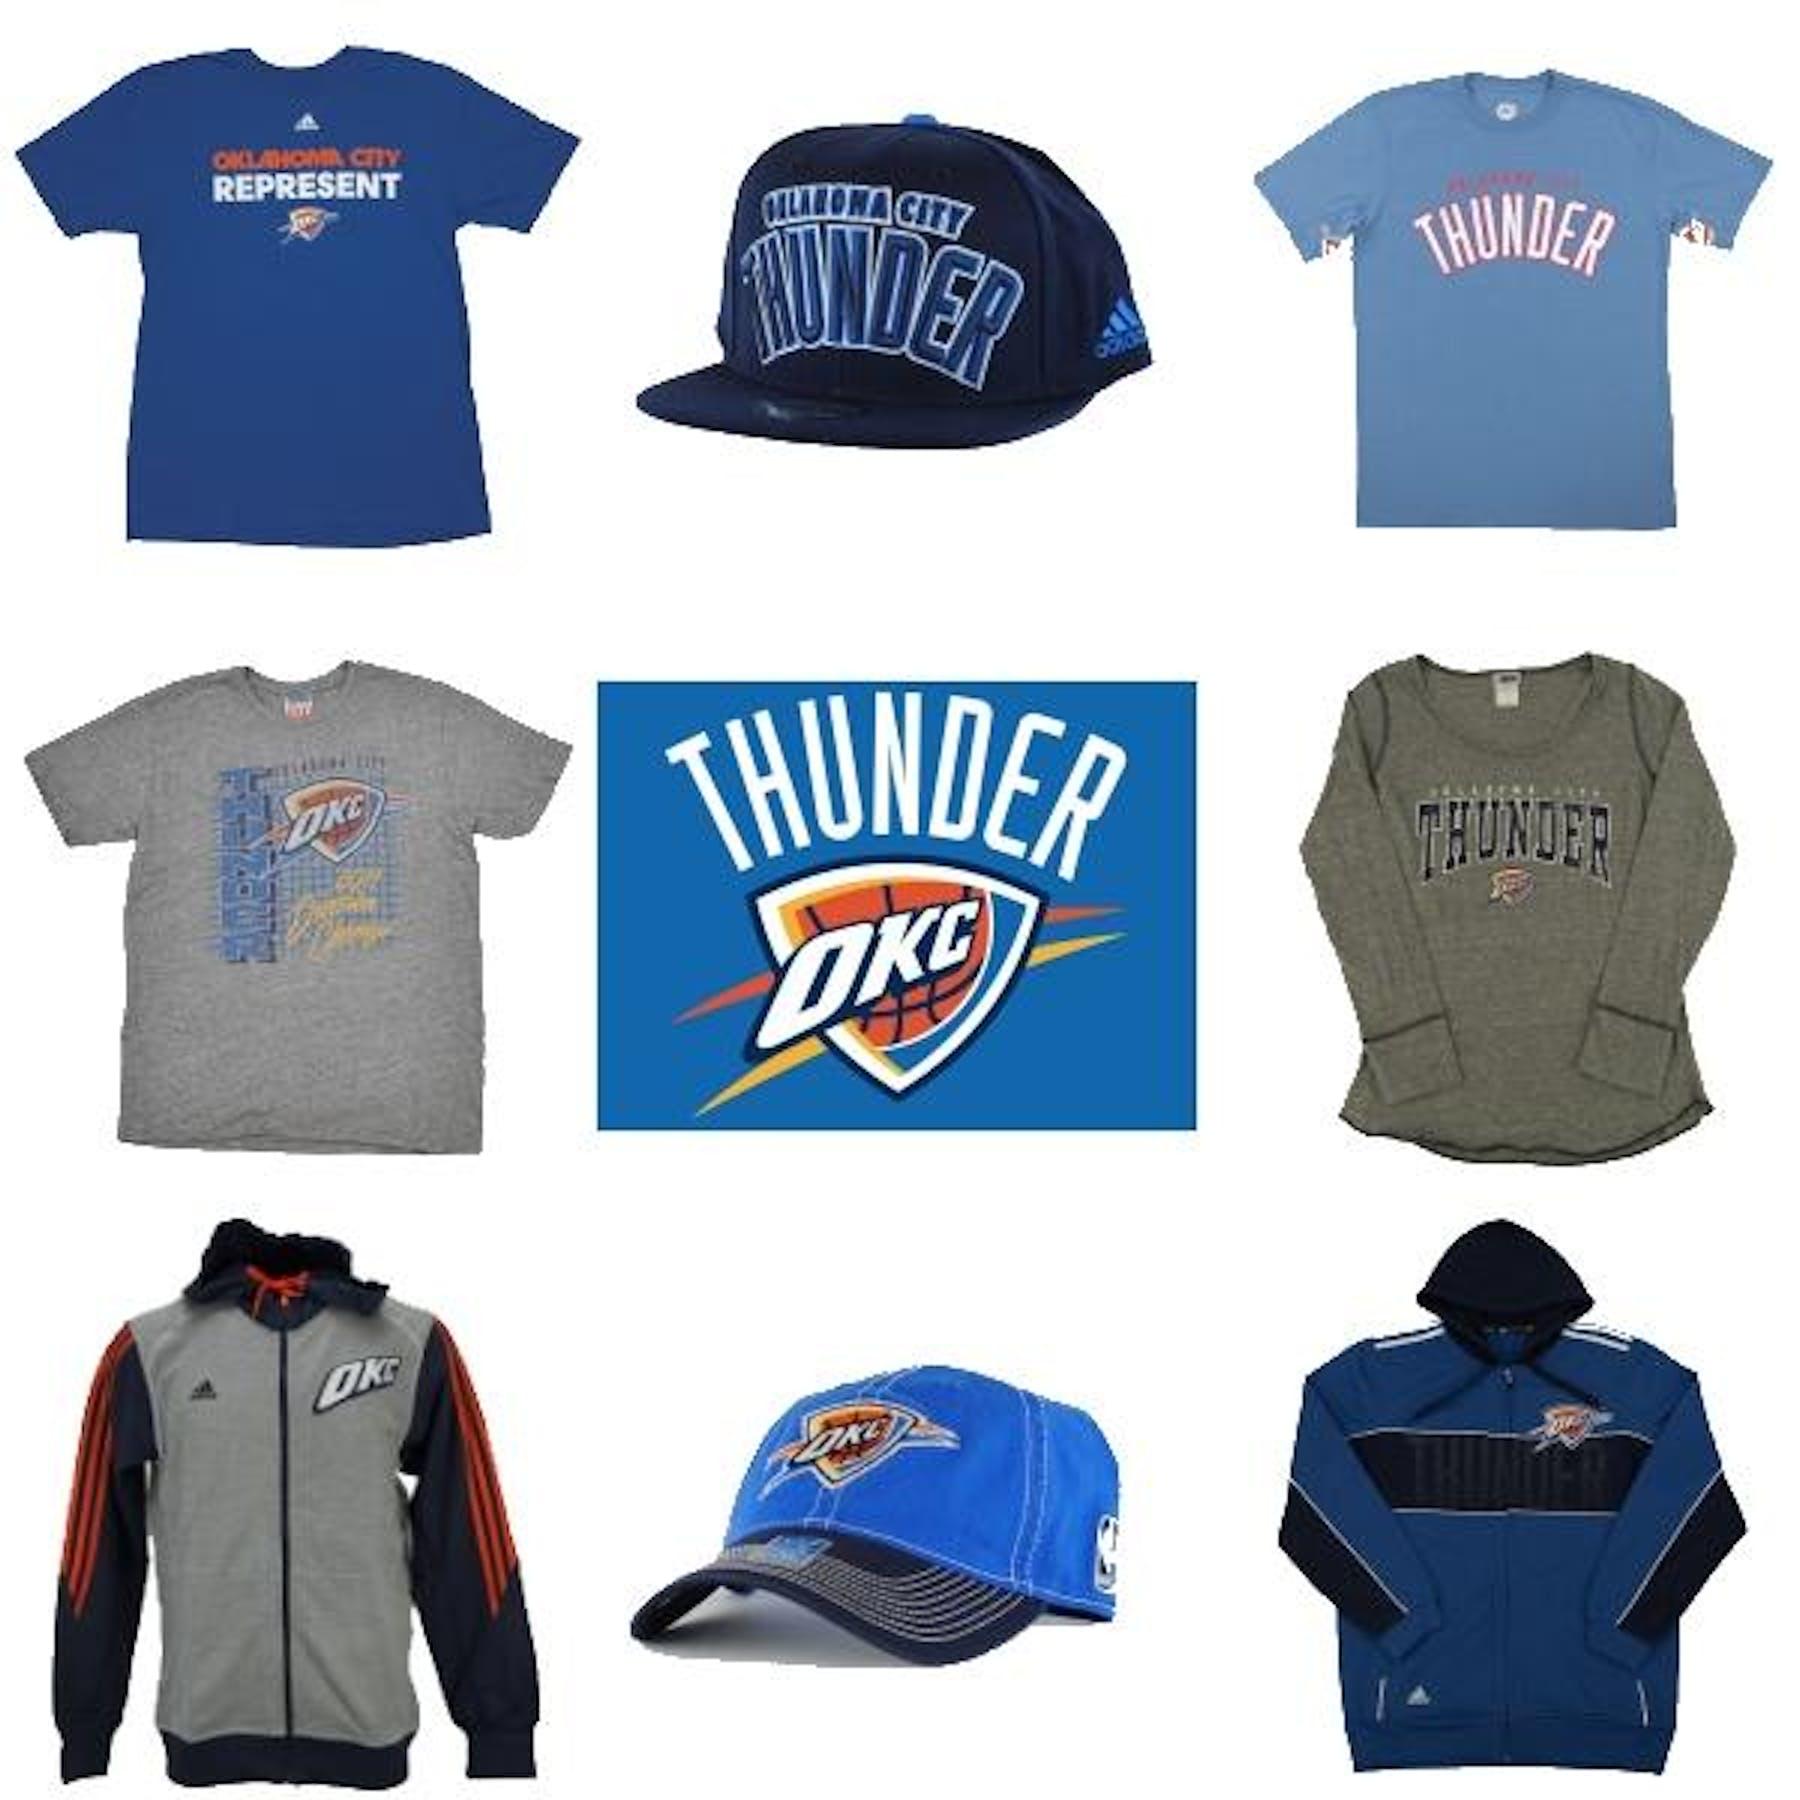 on sale 67667 6d9ea Oklahoma City Thunder Officially Licensed NBA Apparel Liquidation - 860+  Items, $24,000+ SRP!